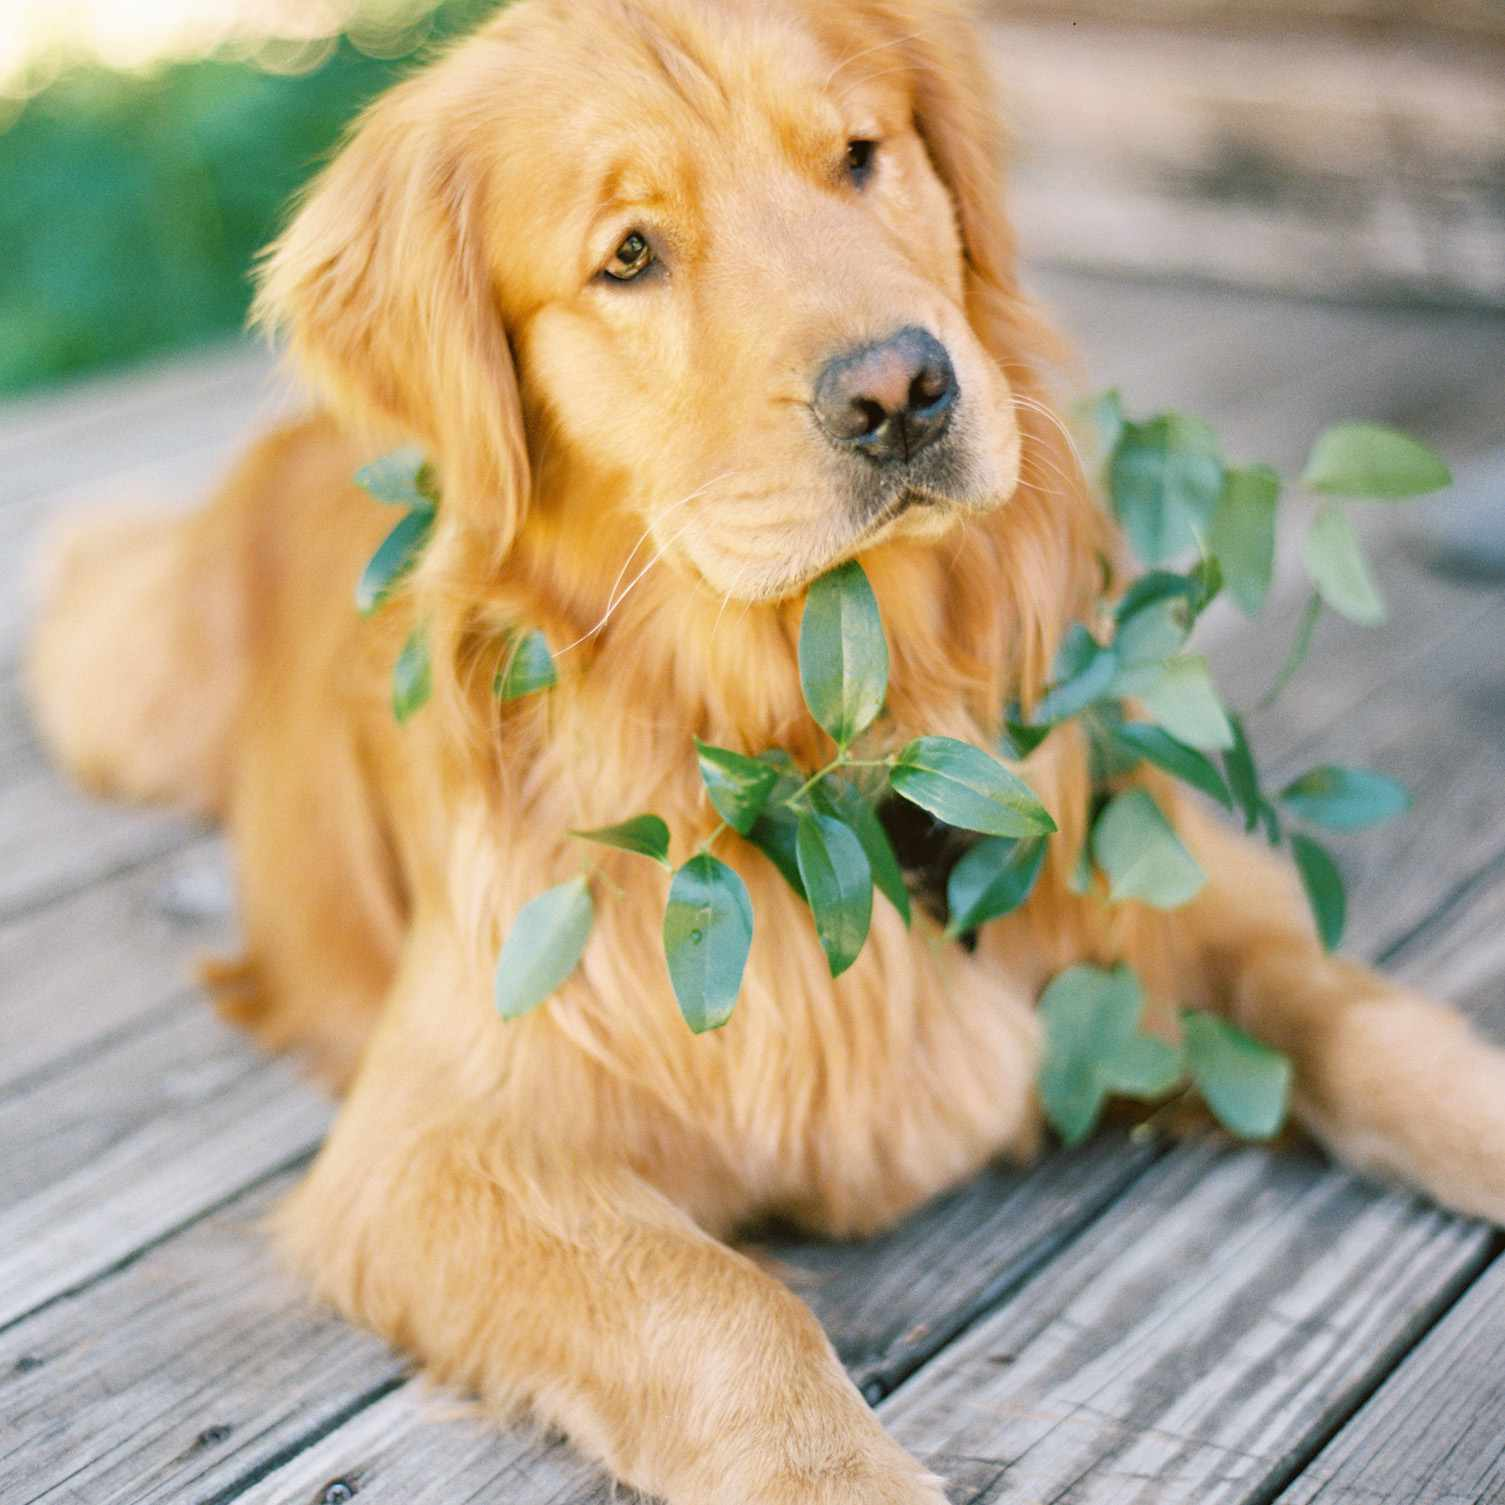 Dog with Greenery Wreath